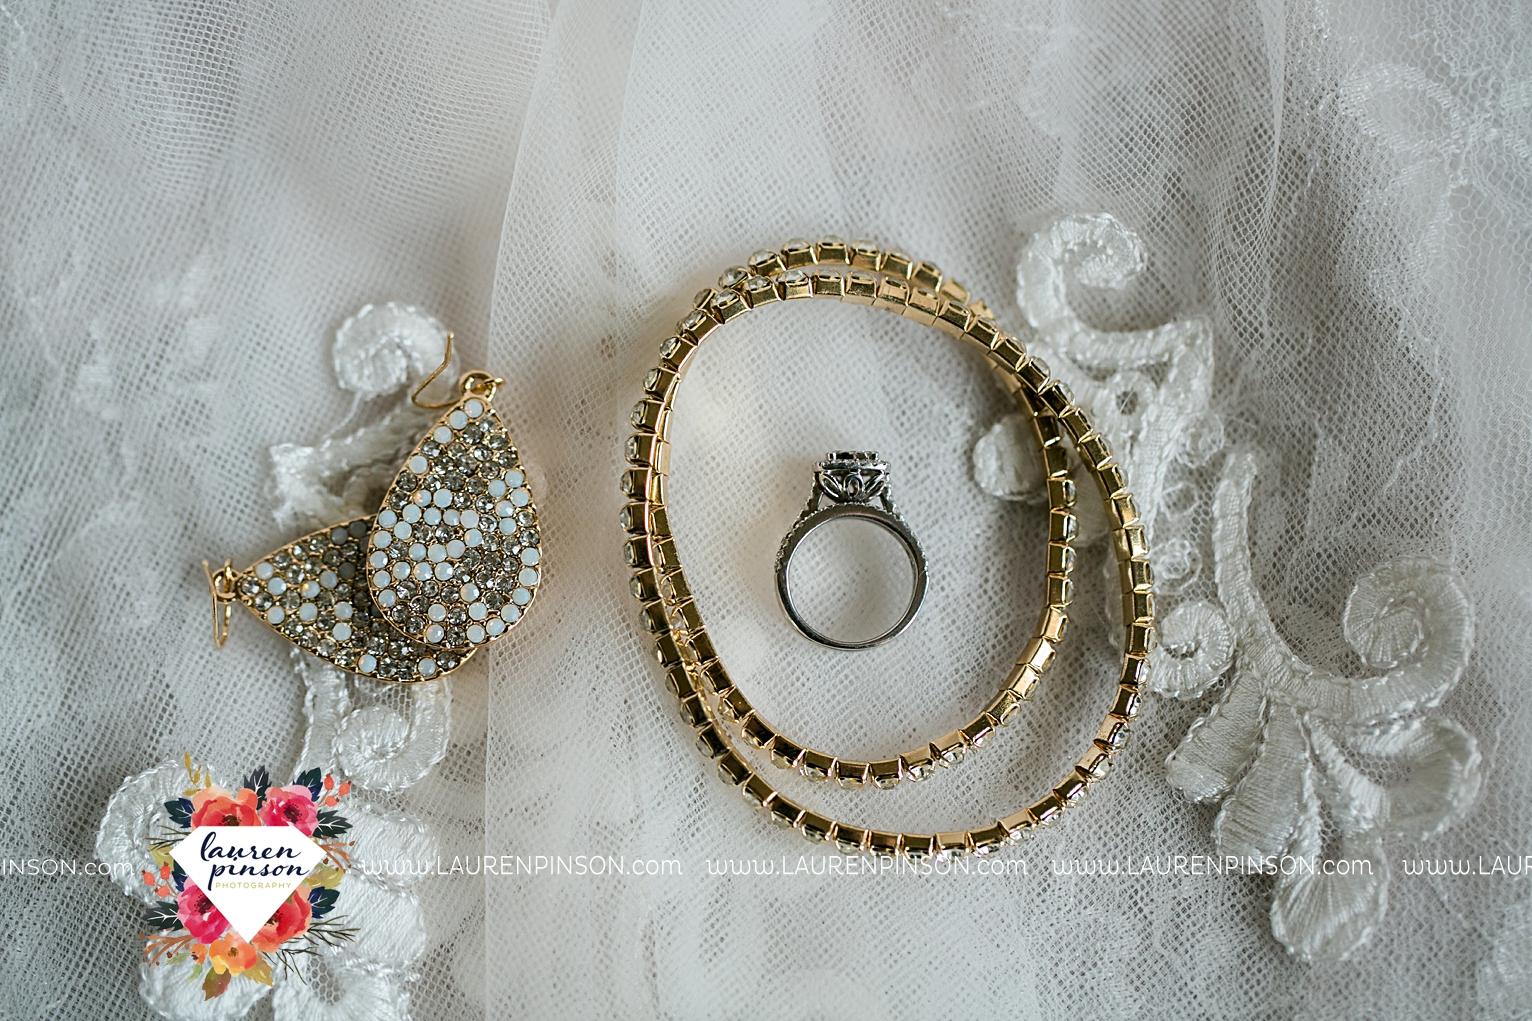 wichita-falls-wedding-nocona-comanche-rose-ranch-rustic-pink-gray-photography-00102.jpg